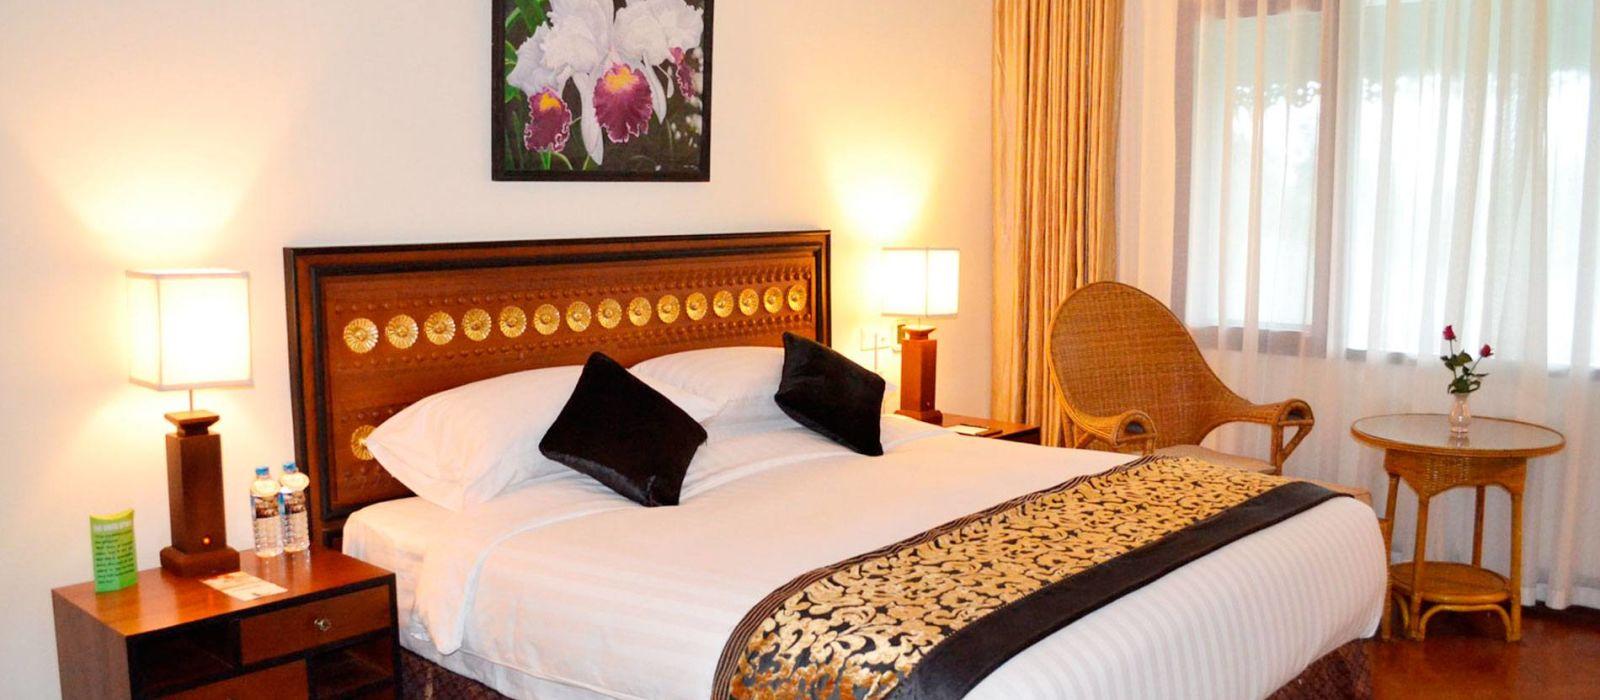 Hotel Kandawgyi Palace Myanmar